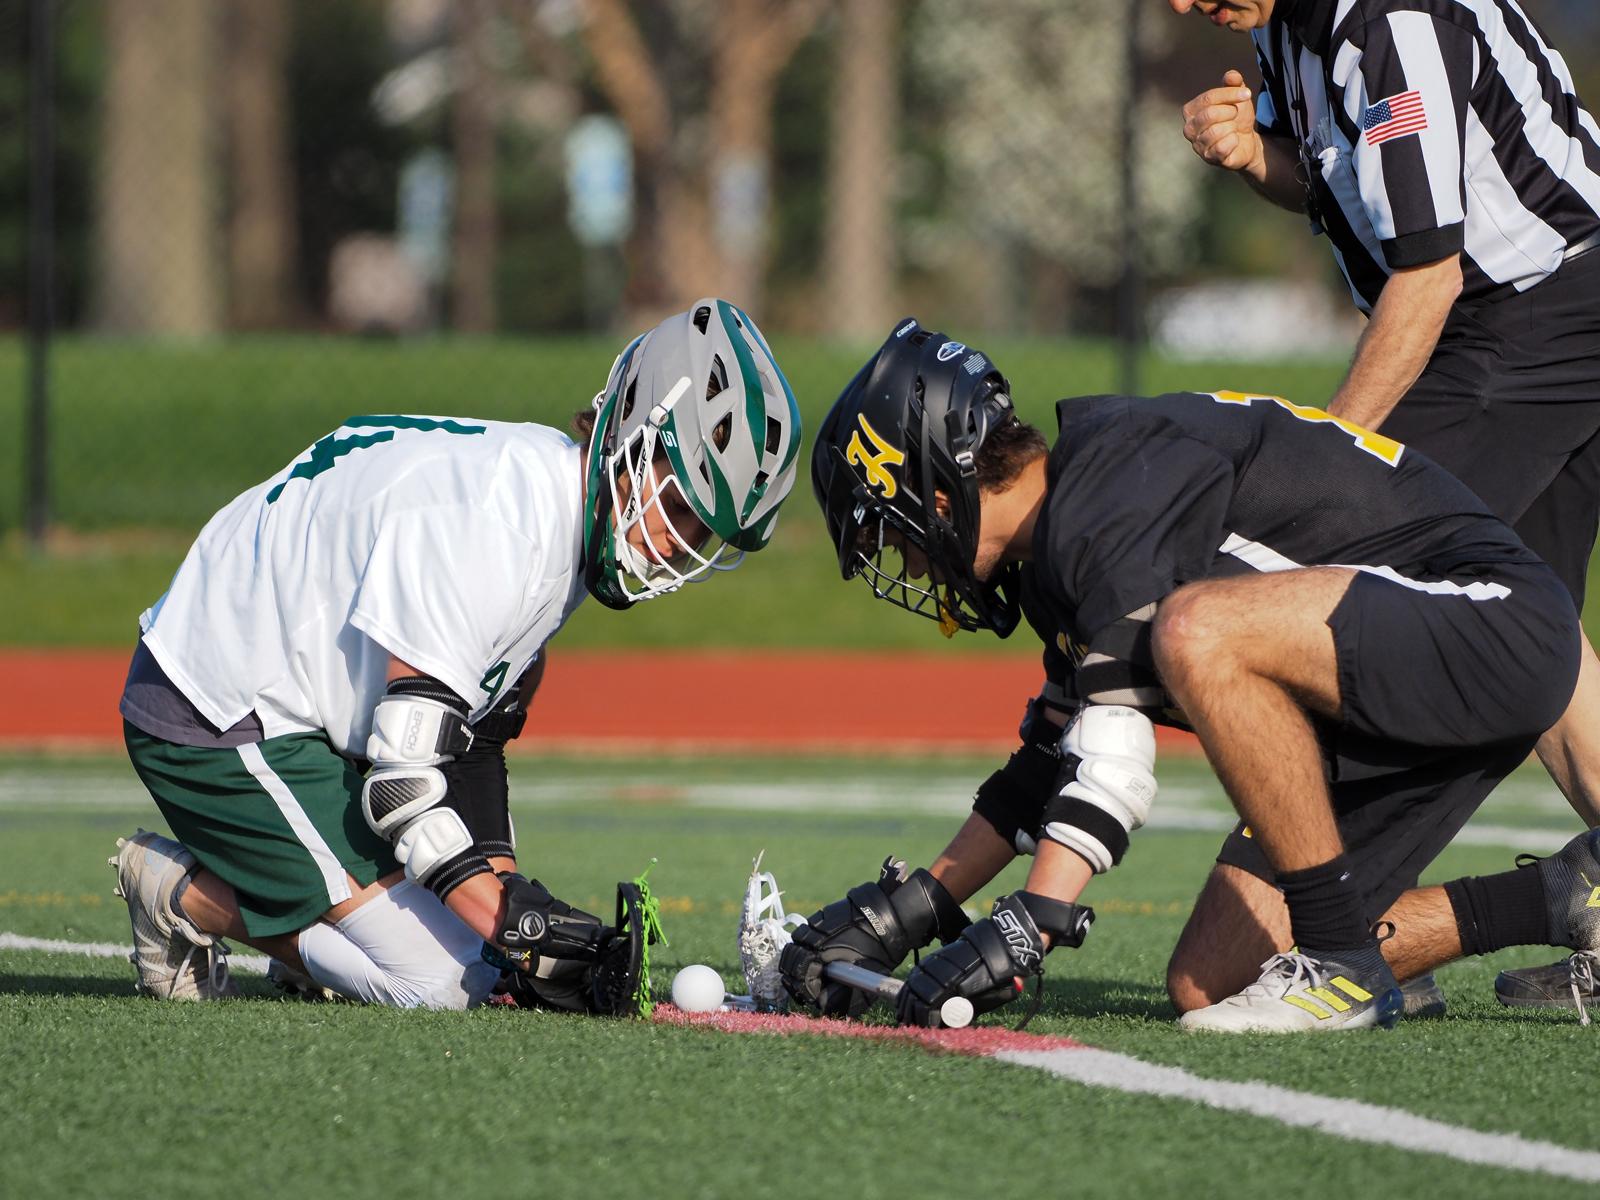 Boys Lacrosse vs Lake – 4/9/21